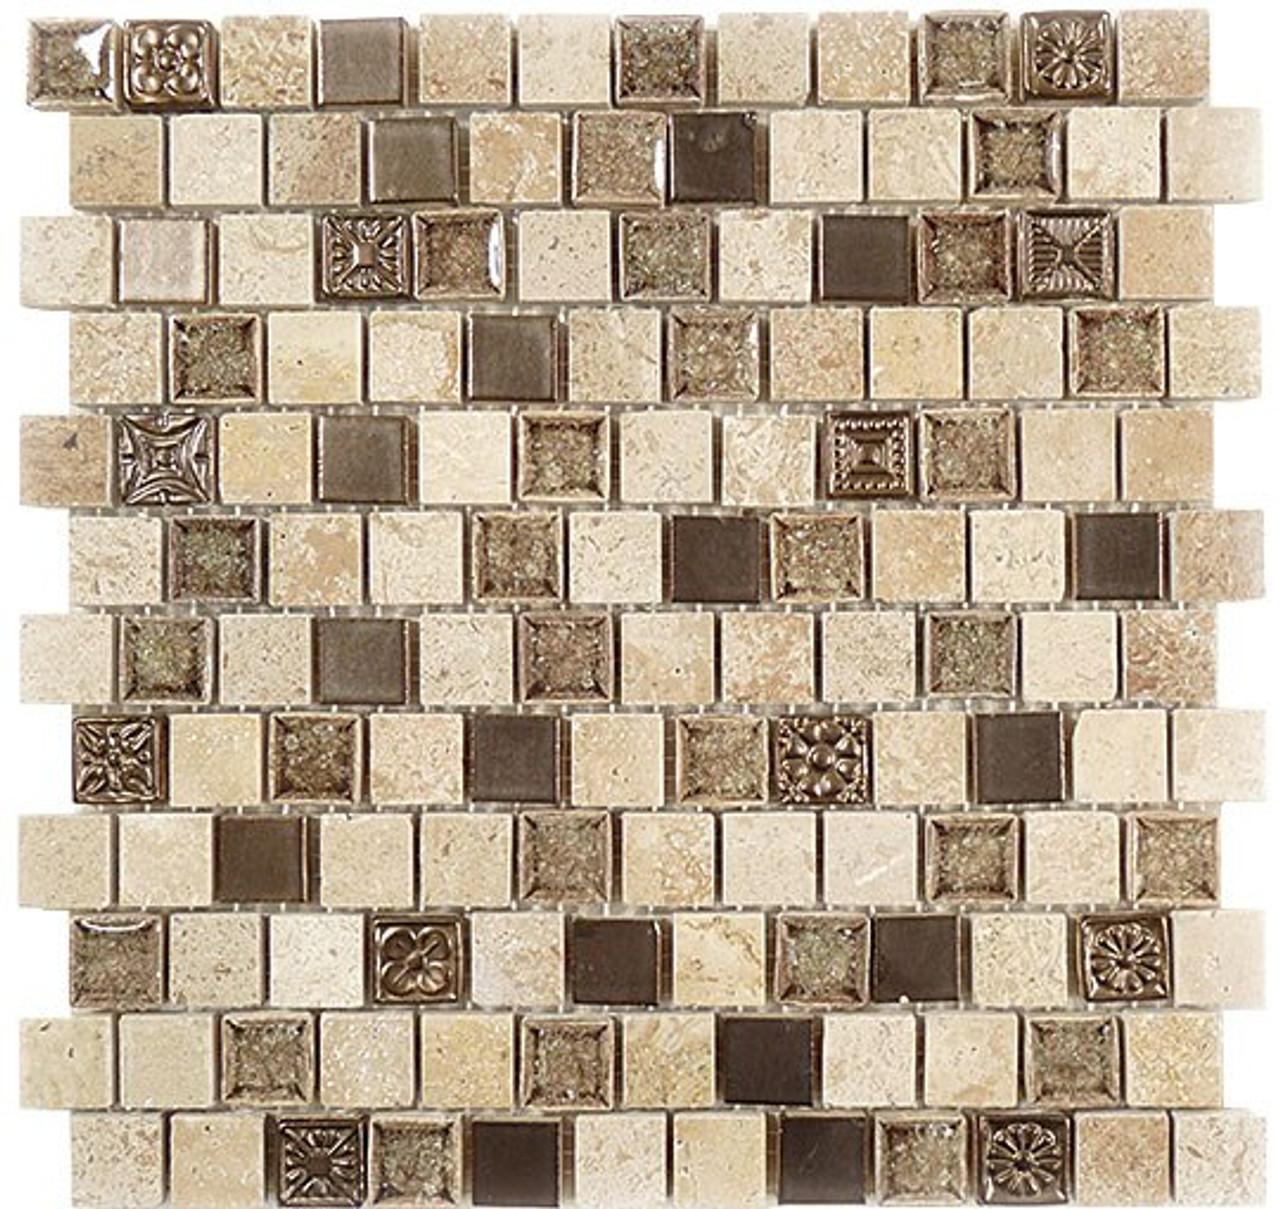 Bella Glass Tiles Tranquil Series Offset Ashen Forest